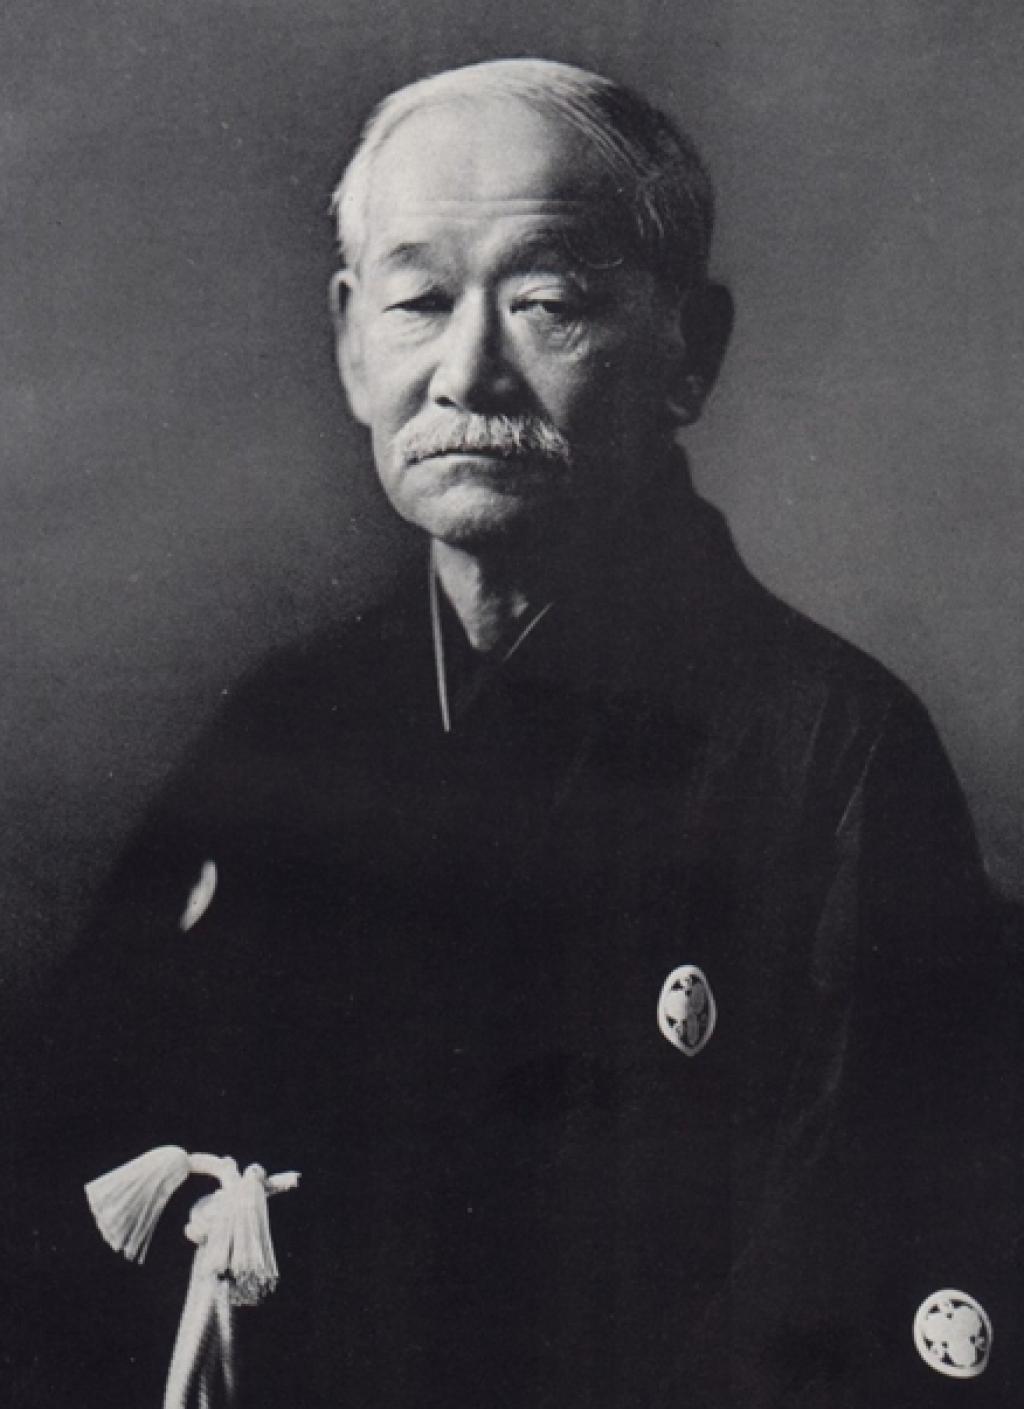 Jigoro Kano celebrates 150th anniversary